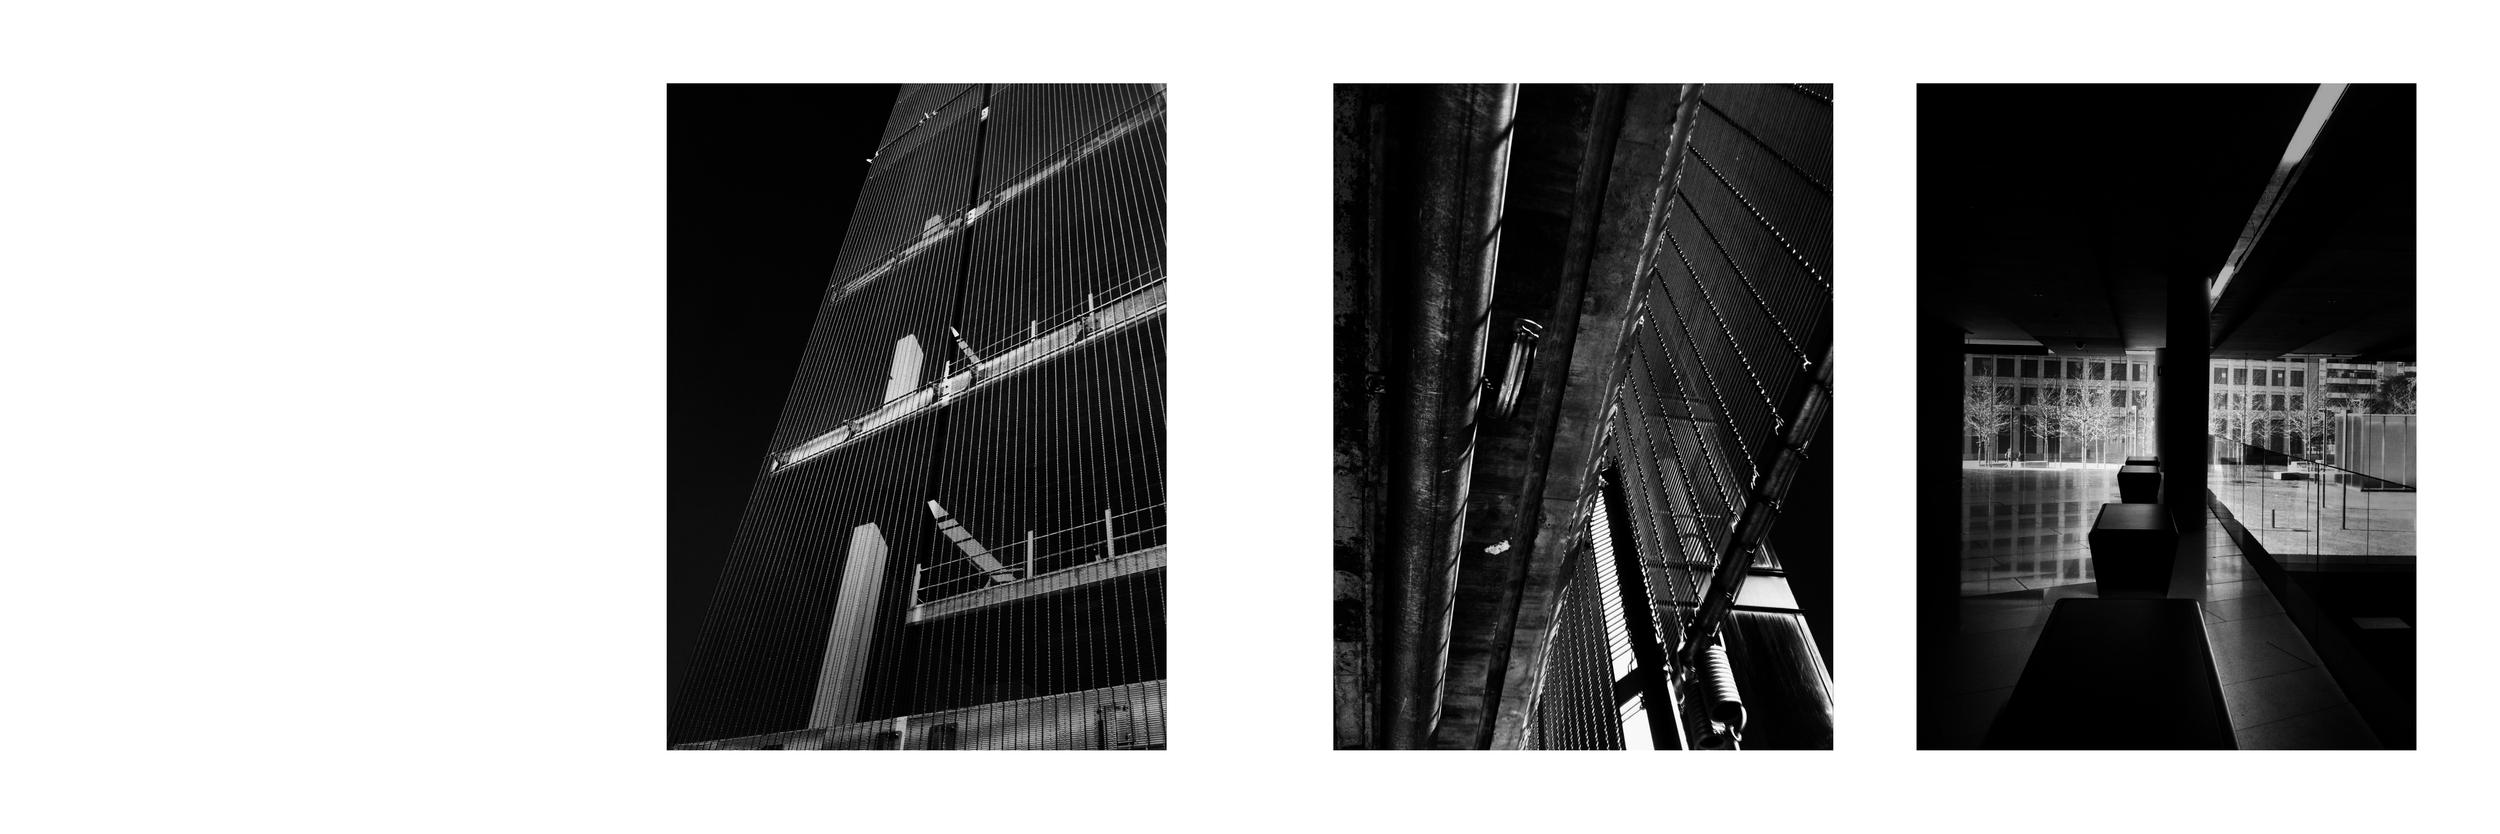 METRO-CITY_05221.jpg